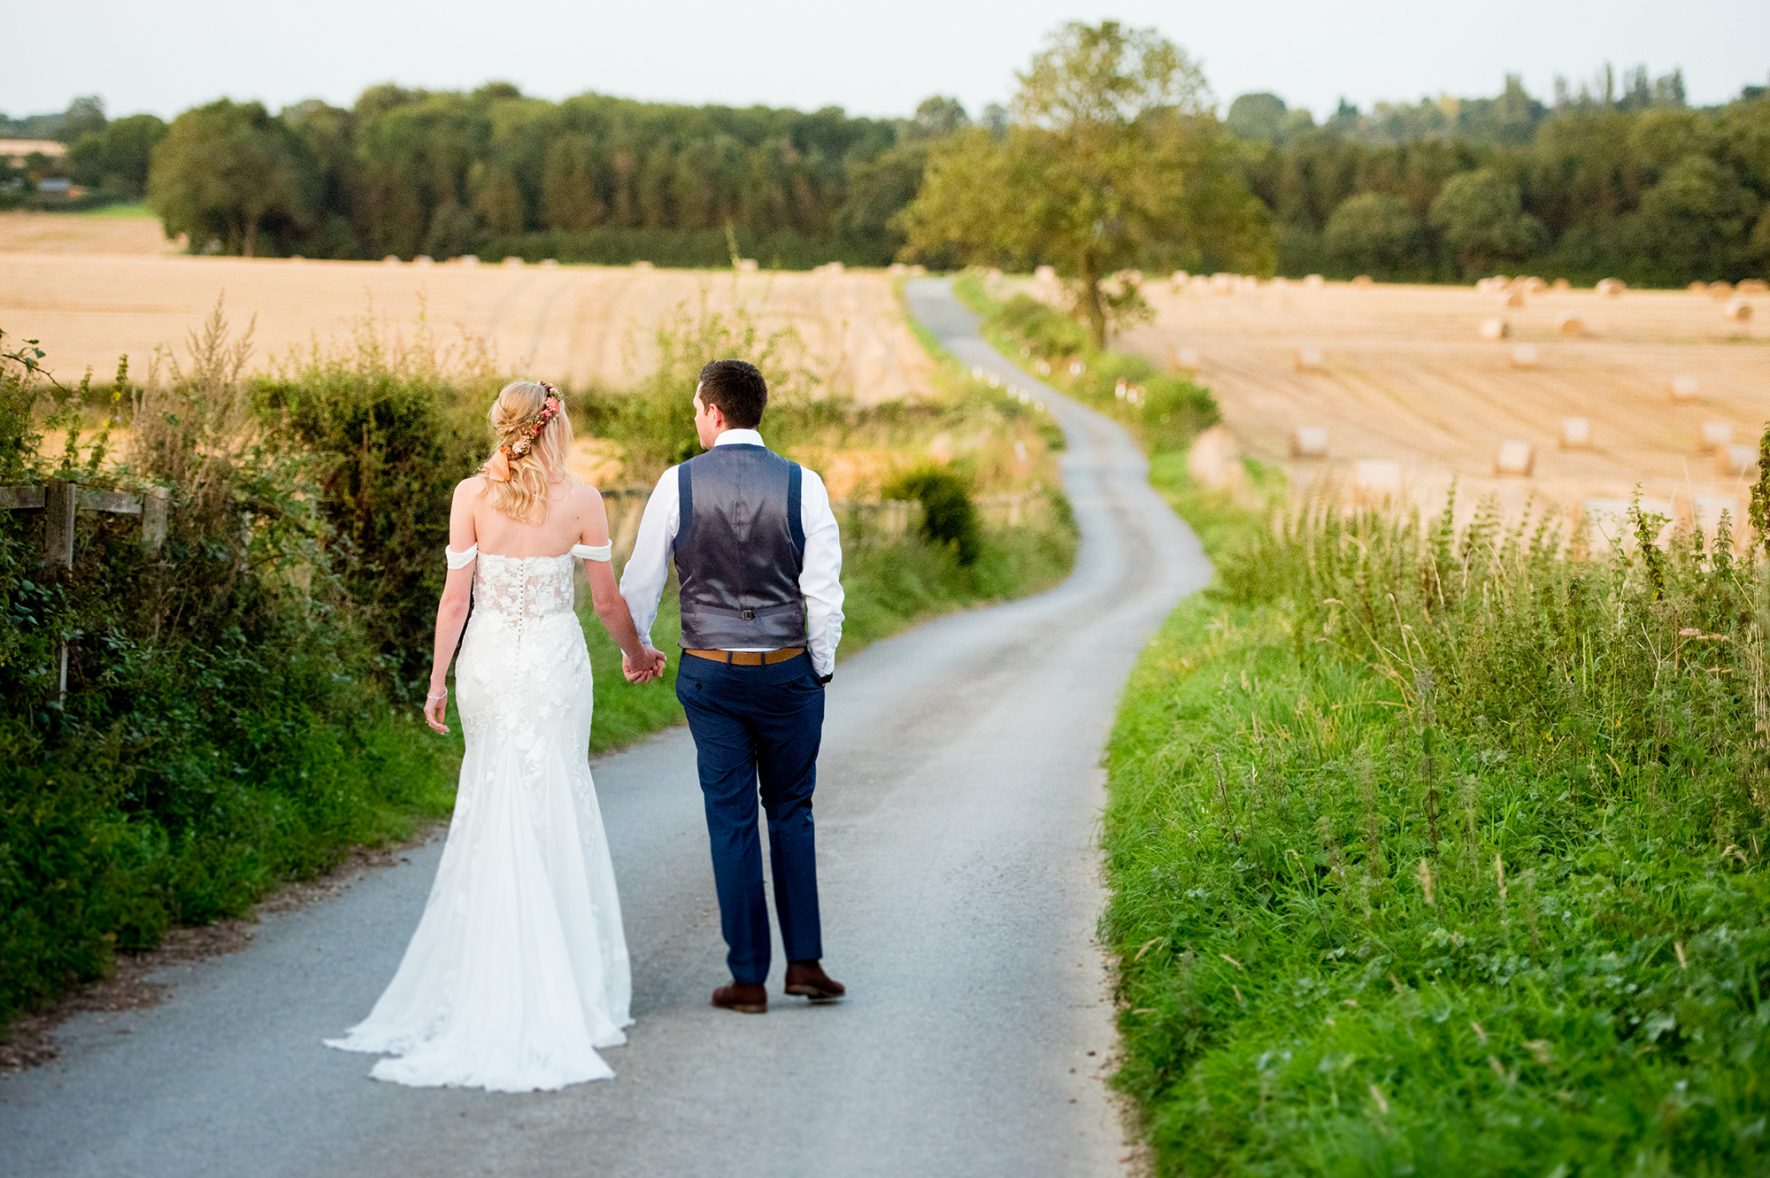 Wedding photography at Swancar